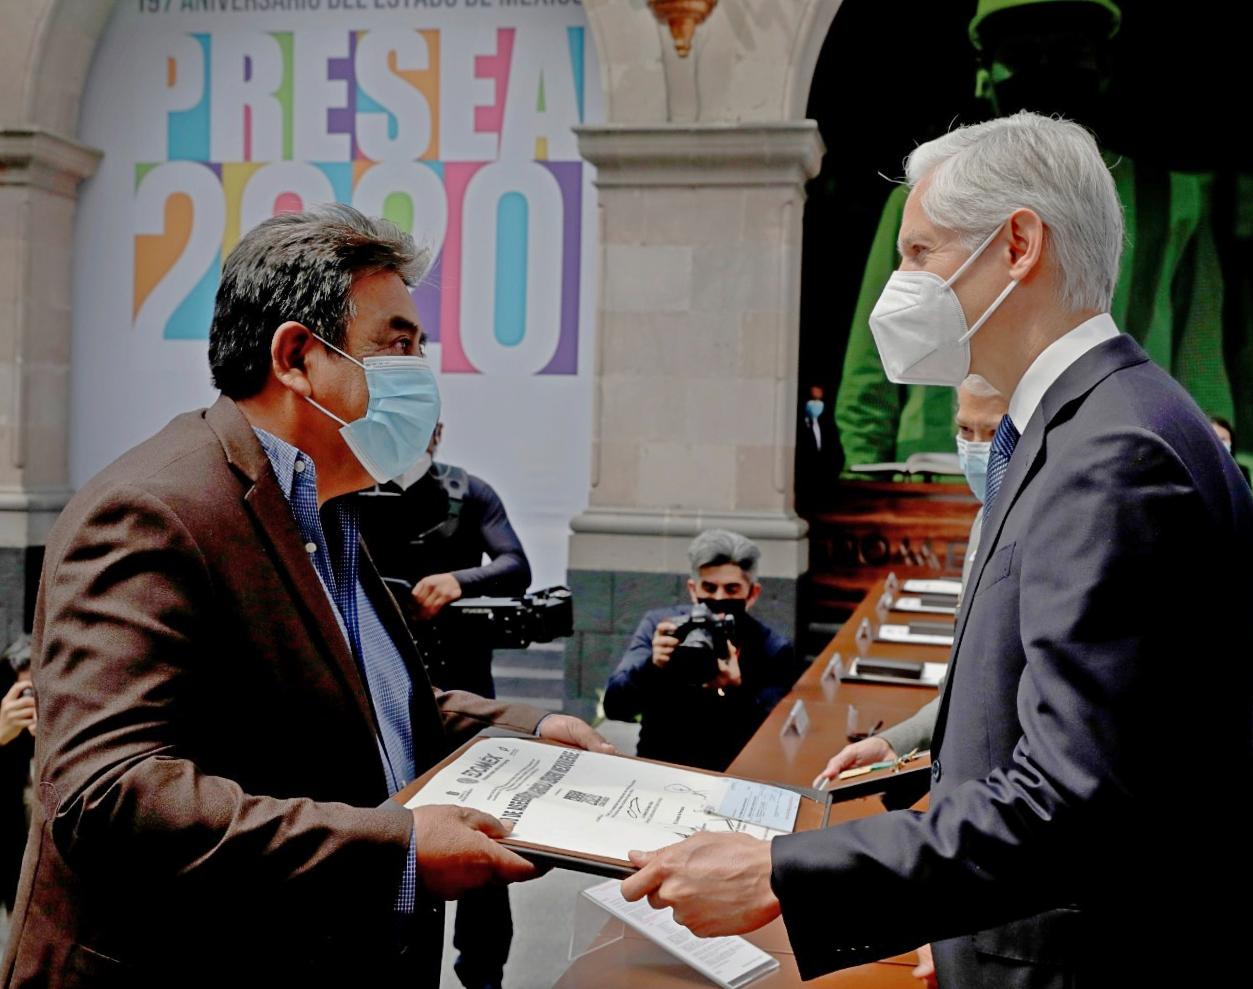 ORGANIZACIÓN DE AXAPUSCO RECIBE LA PRIMERA PRESEA ESTADO DE MÉXICO 2020 AL MÉRITO AGRARIO